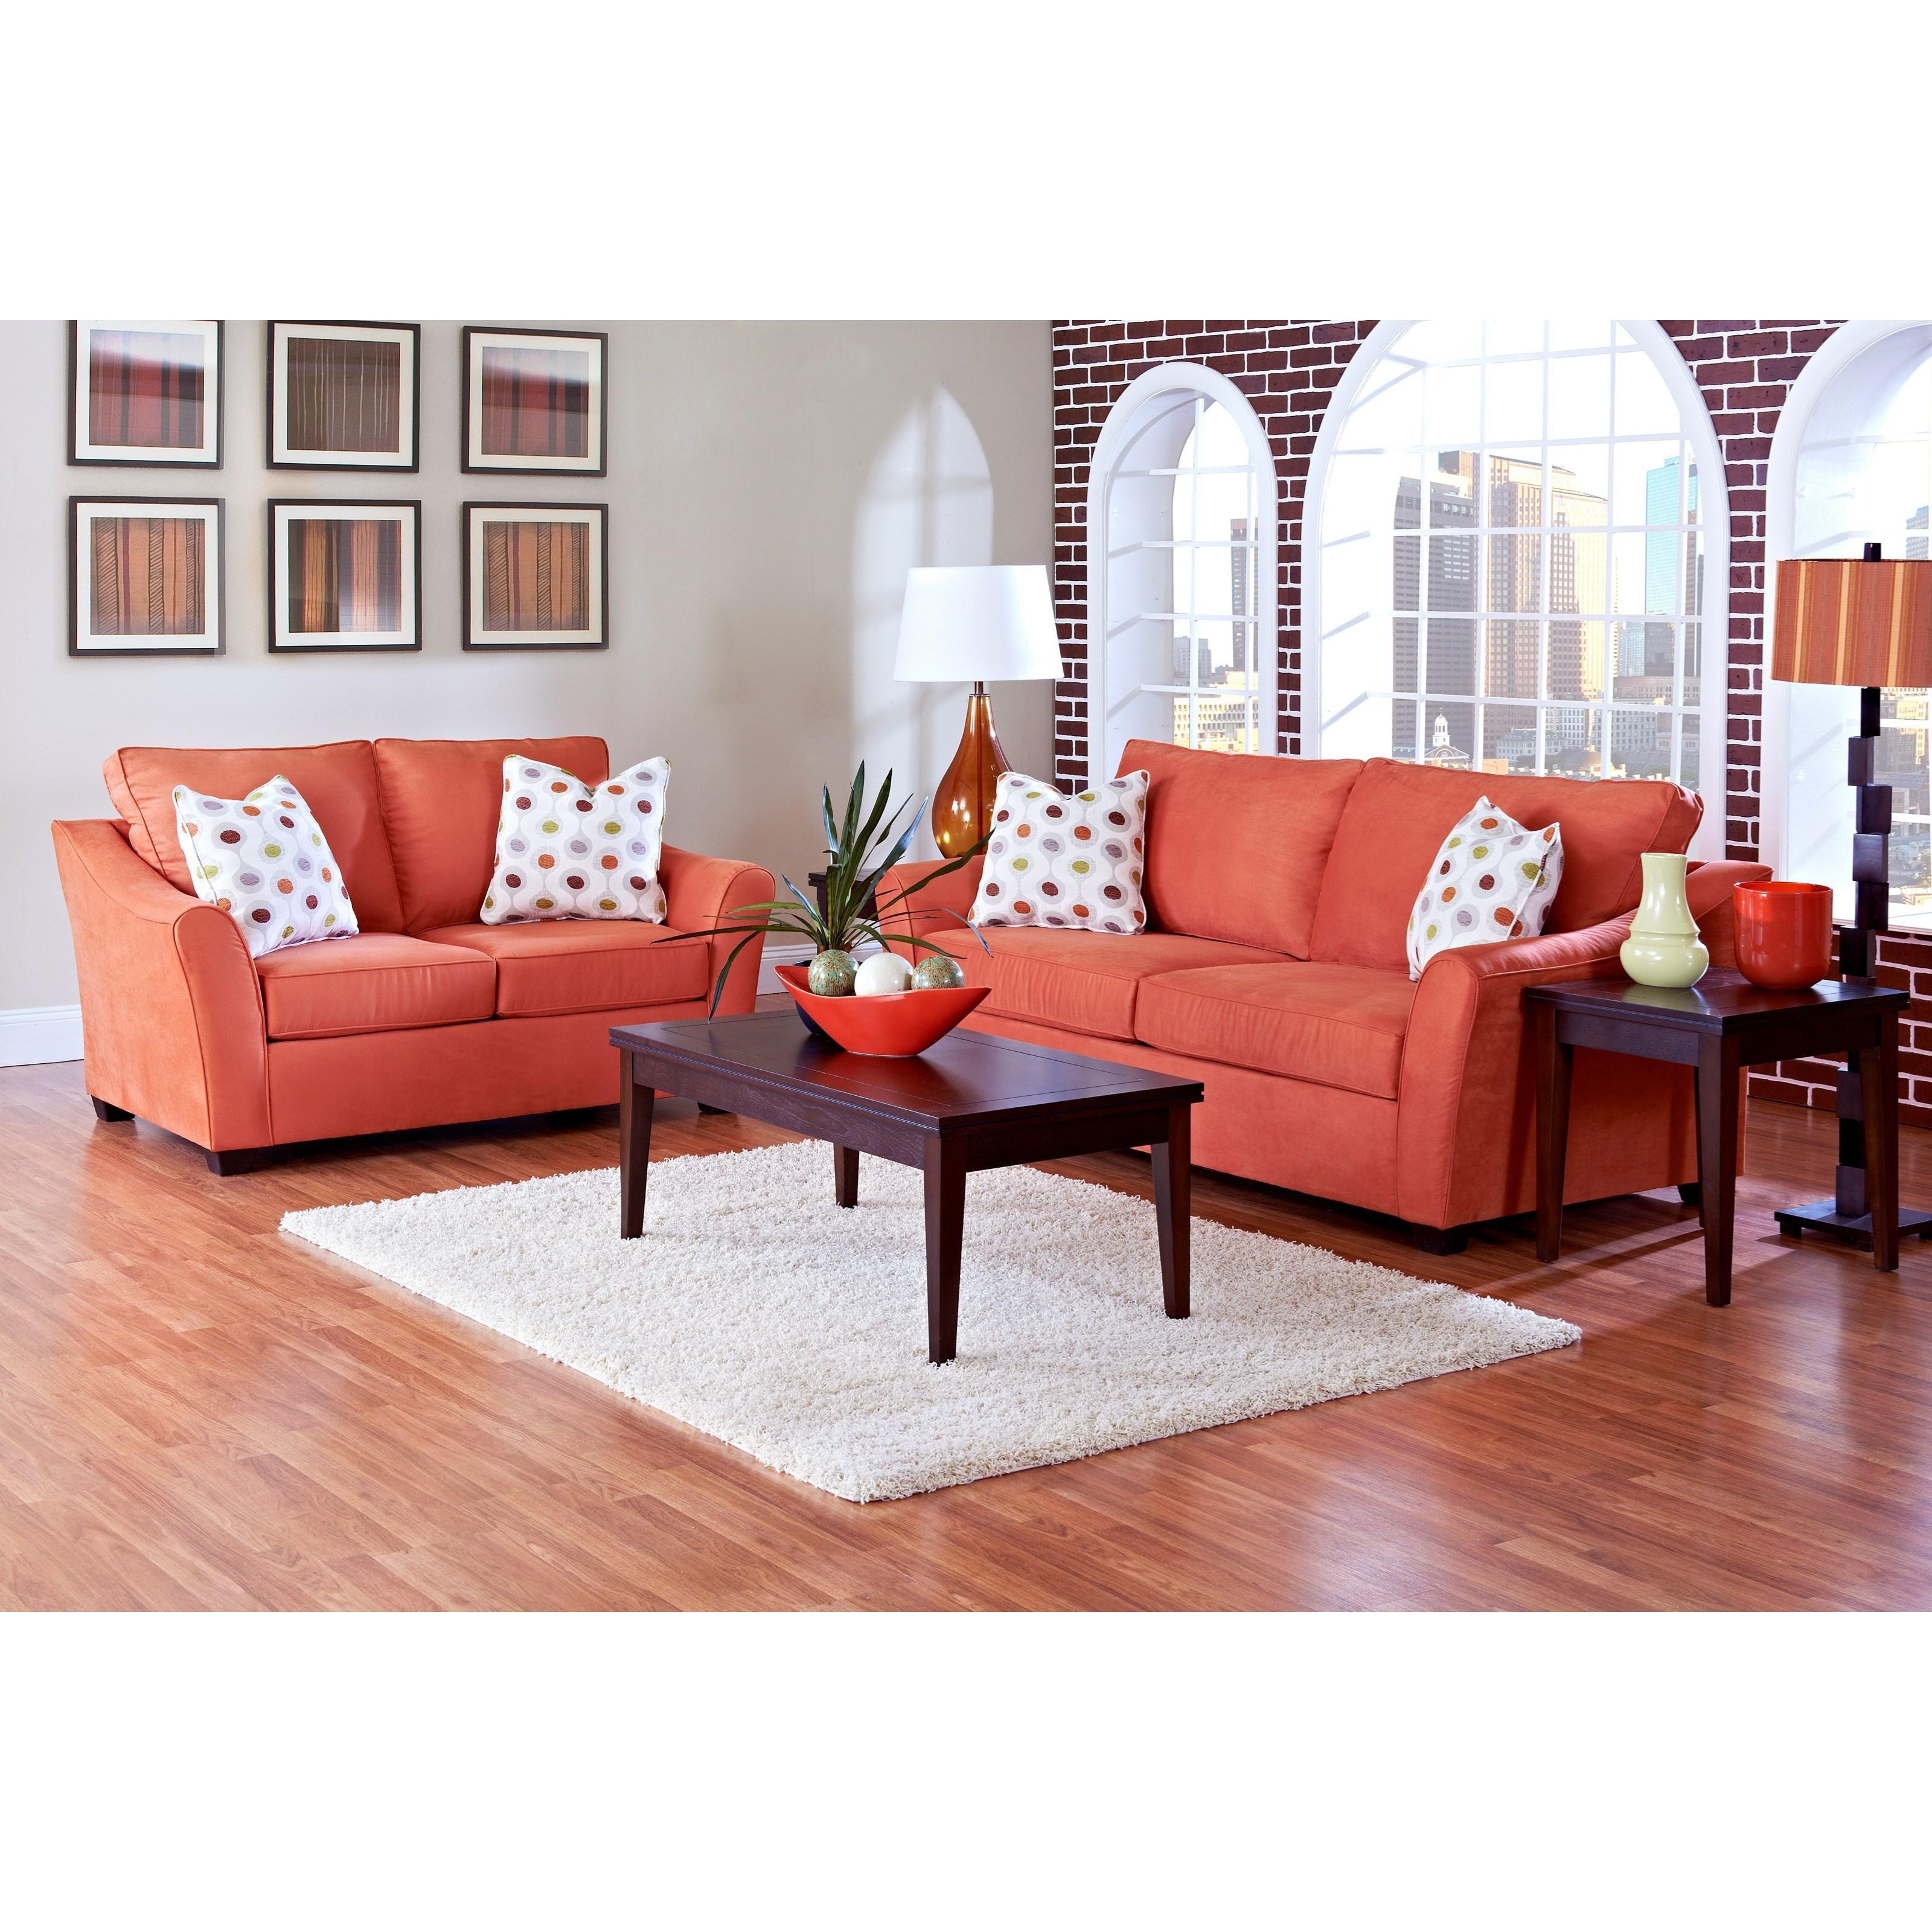 Klaussner linville living room group pilgrim furniture for Living room furniture groups